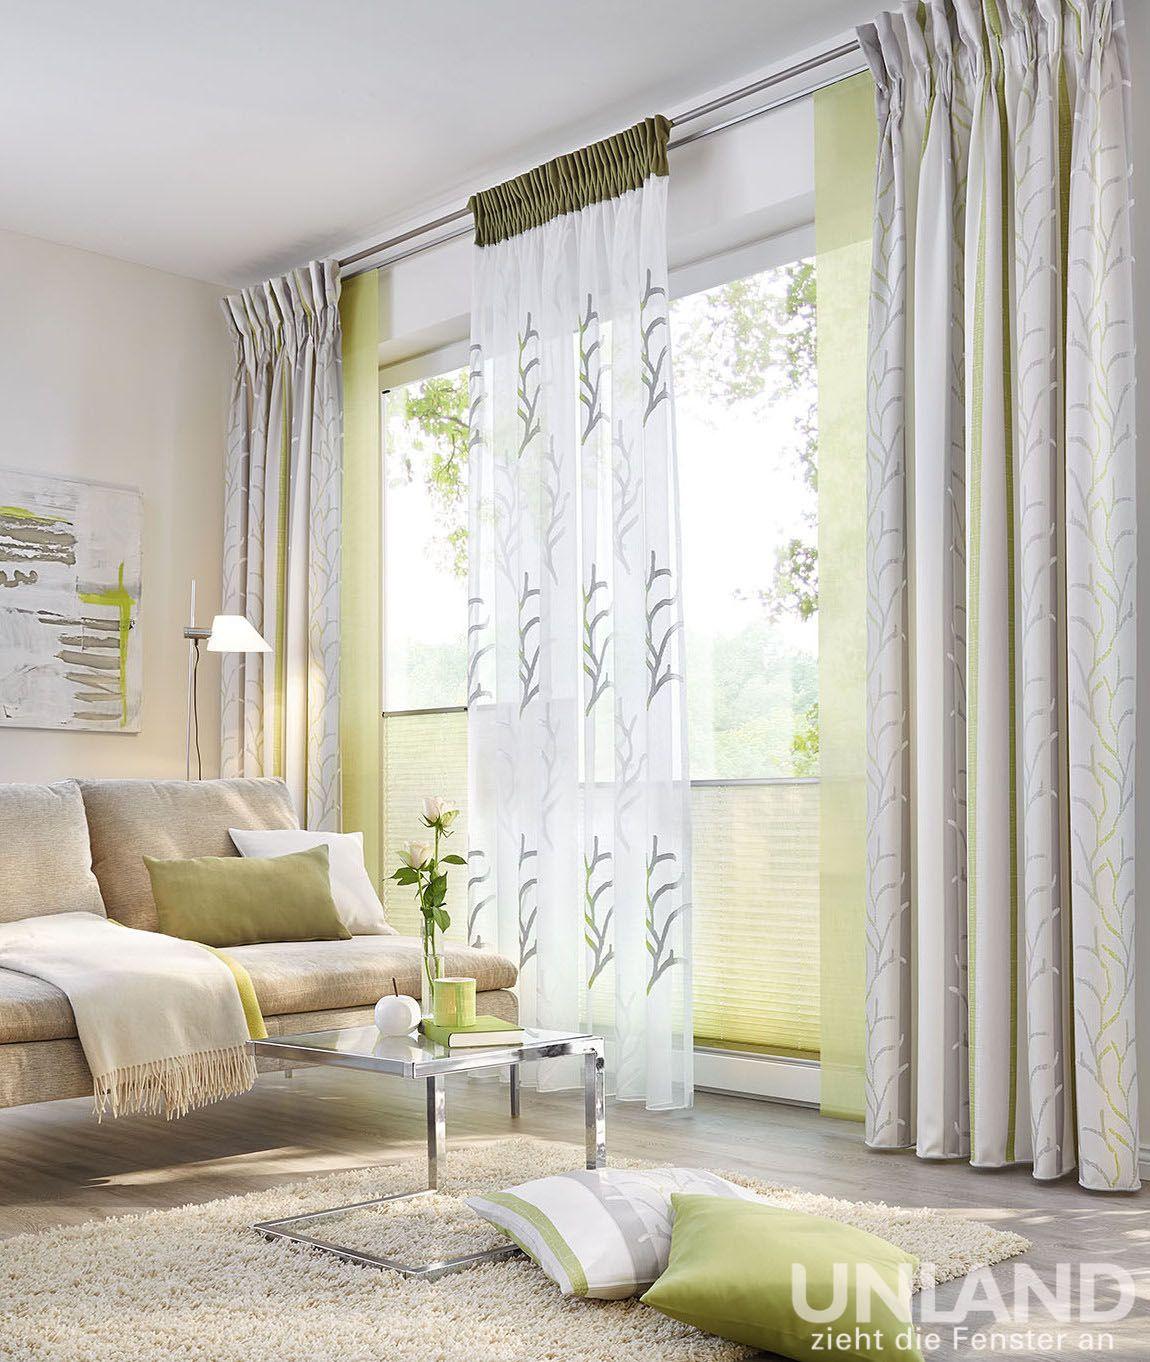 unland palma greenery 001 vorhang fensterideen. Black Bedroom Furniture Sets. Home Design Ideas